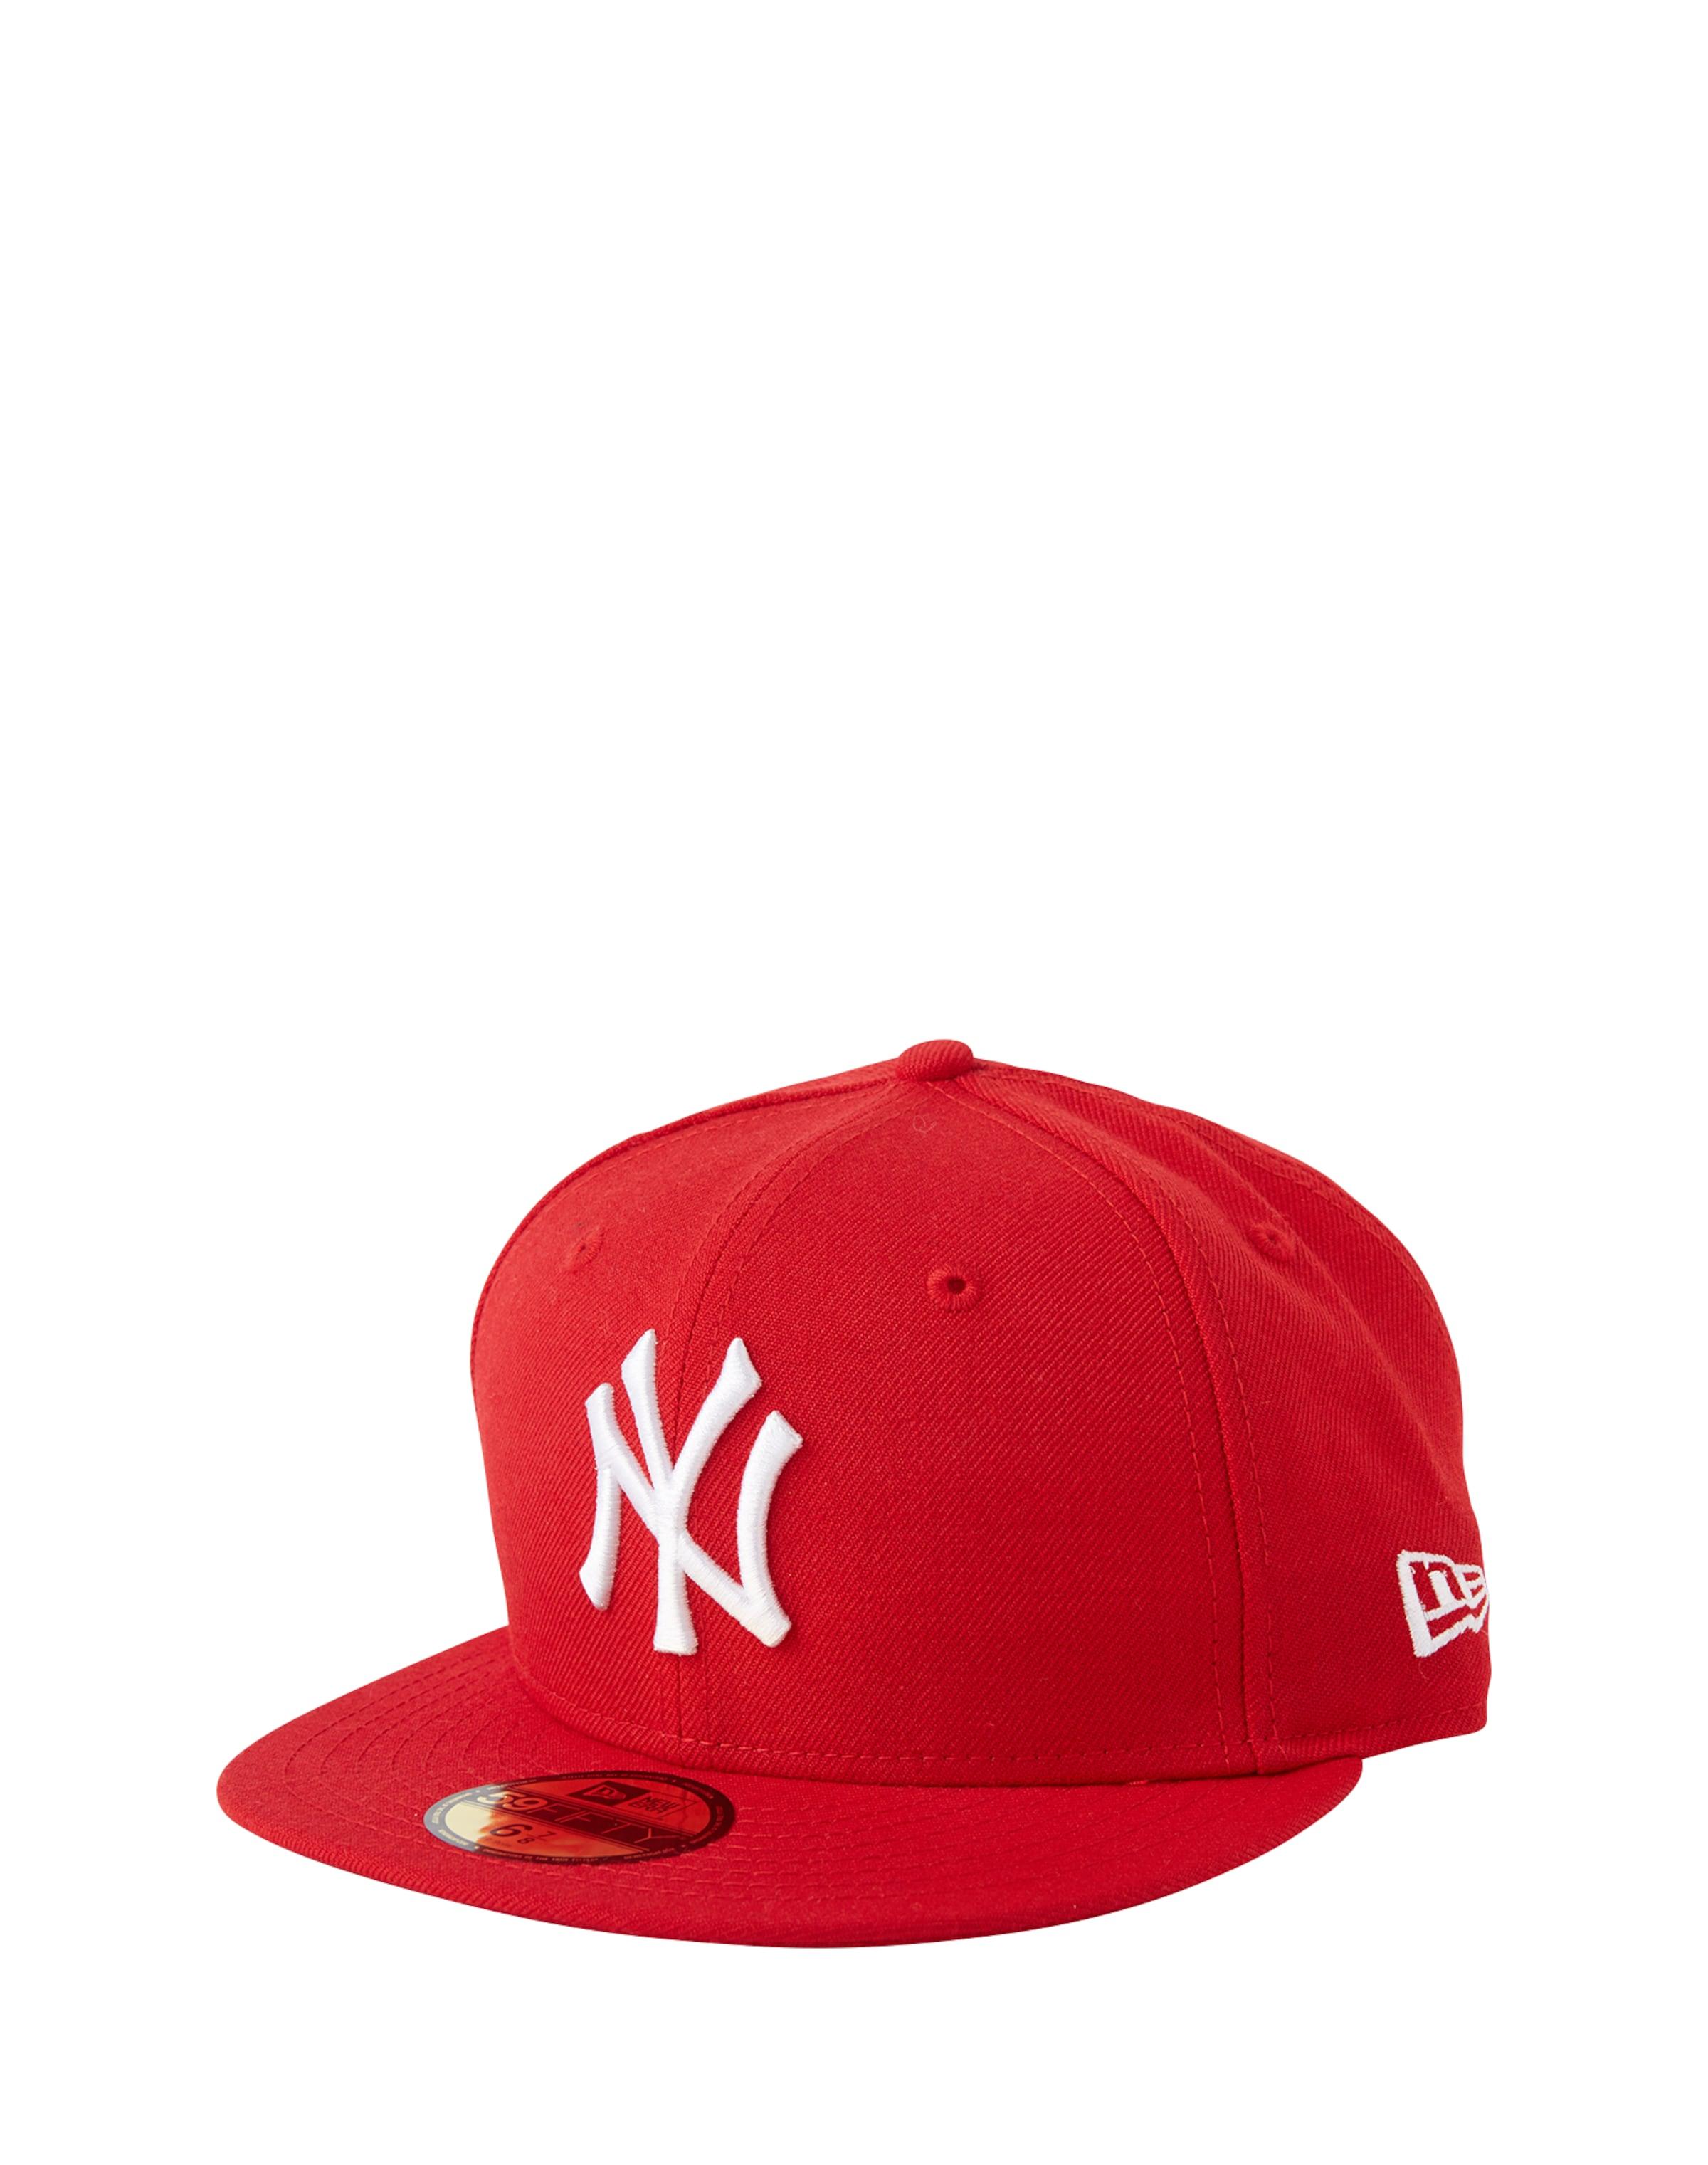 Basic Yankees' Era York En New Casquette Rouge '59fifty Mlb CxrBode